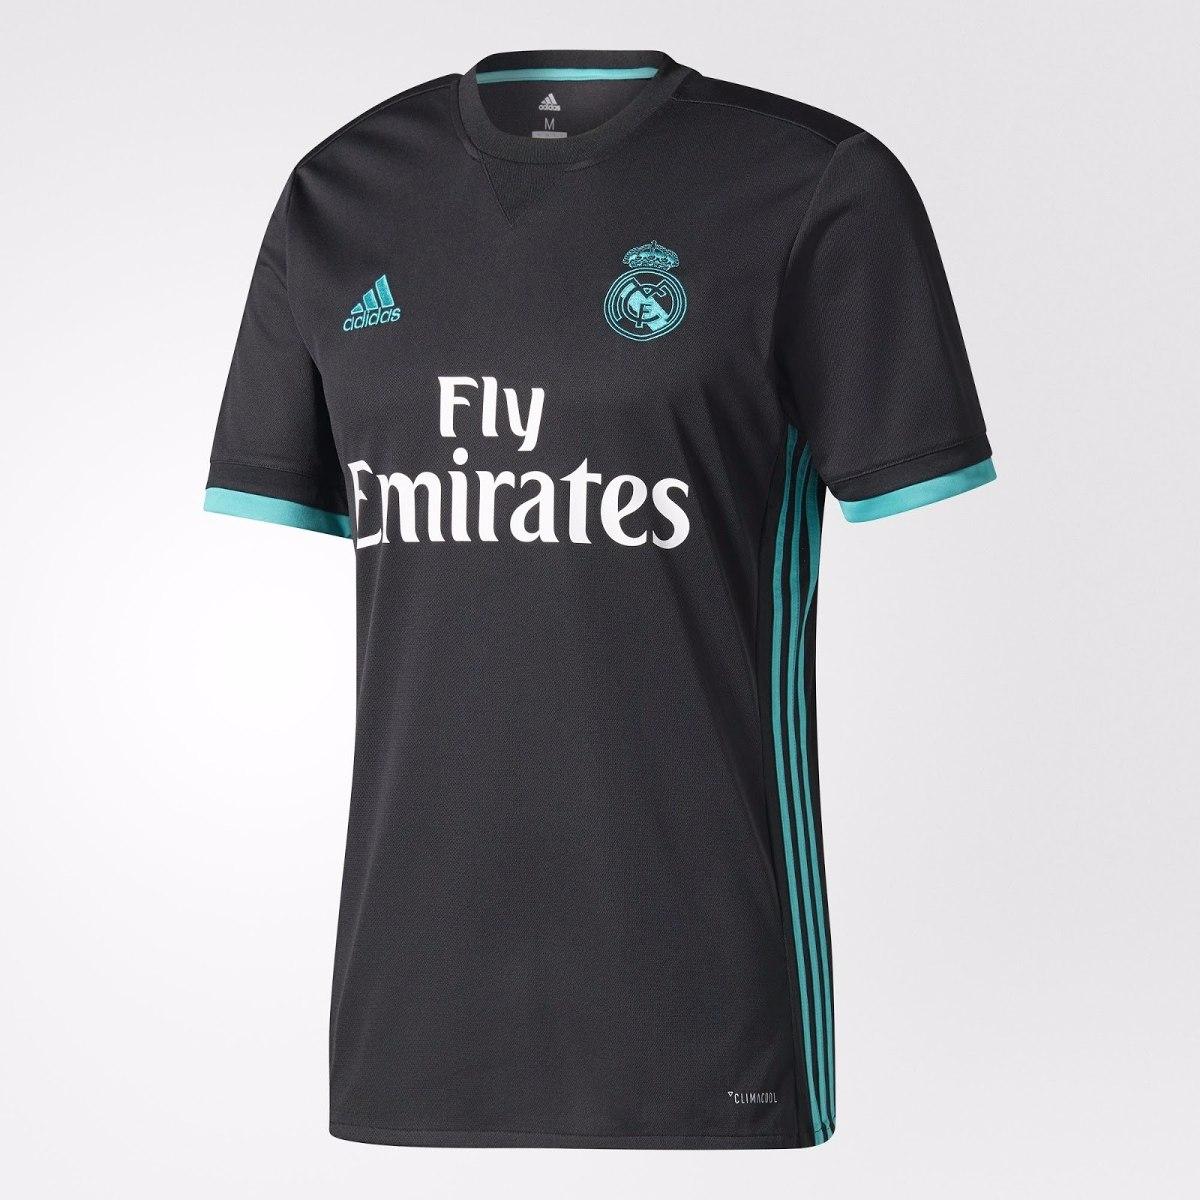 Camiseta Real Madrid Adizero Ronaldo d60f3a07112ef